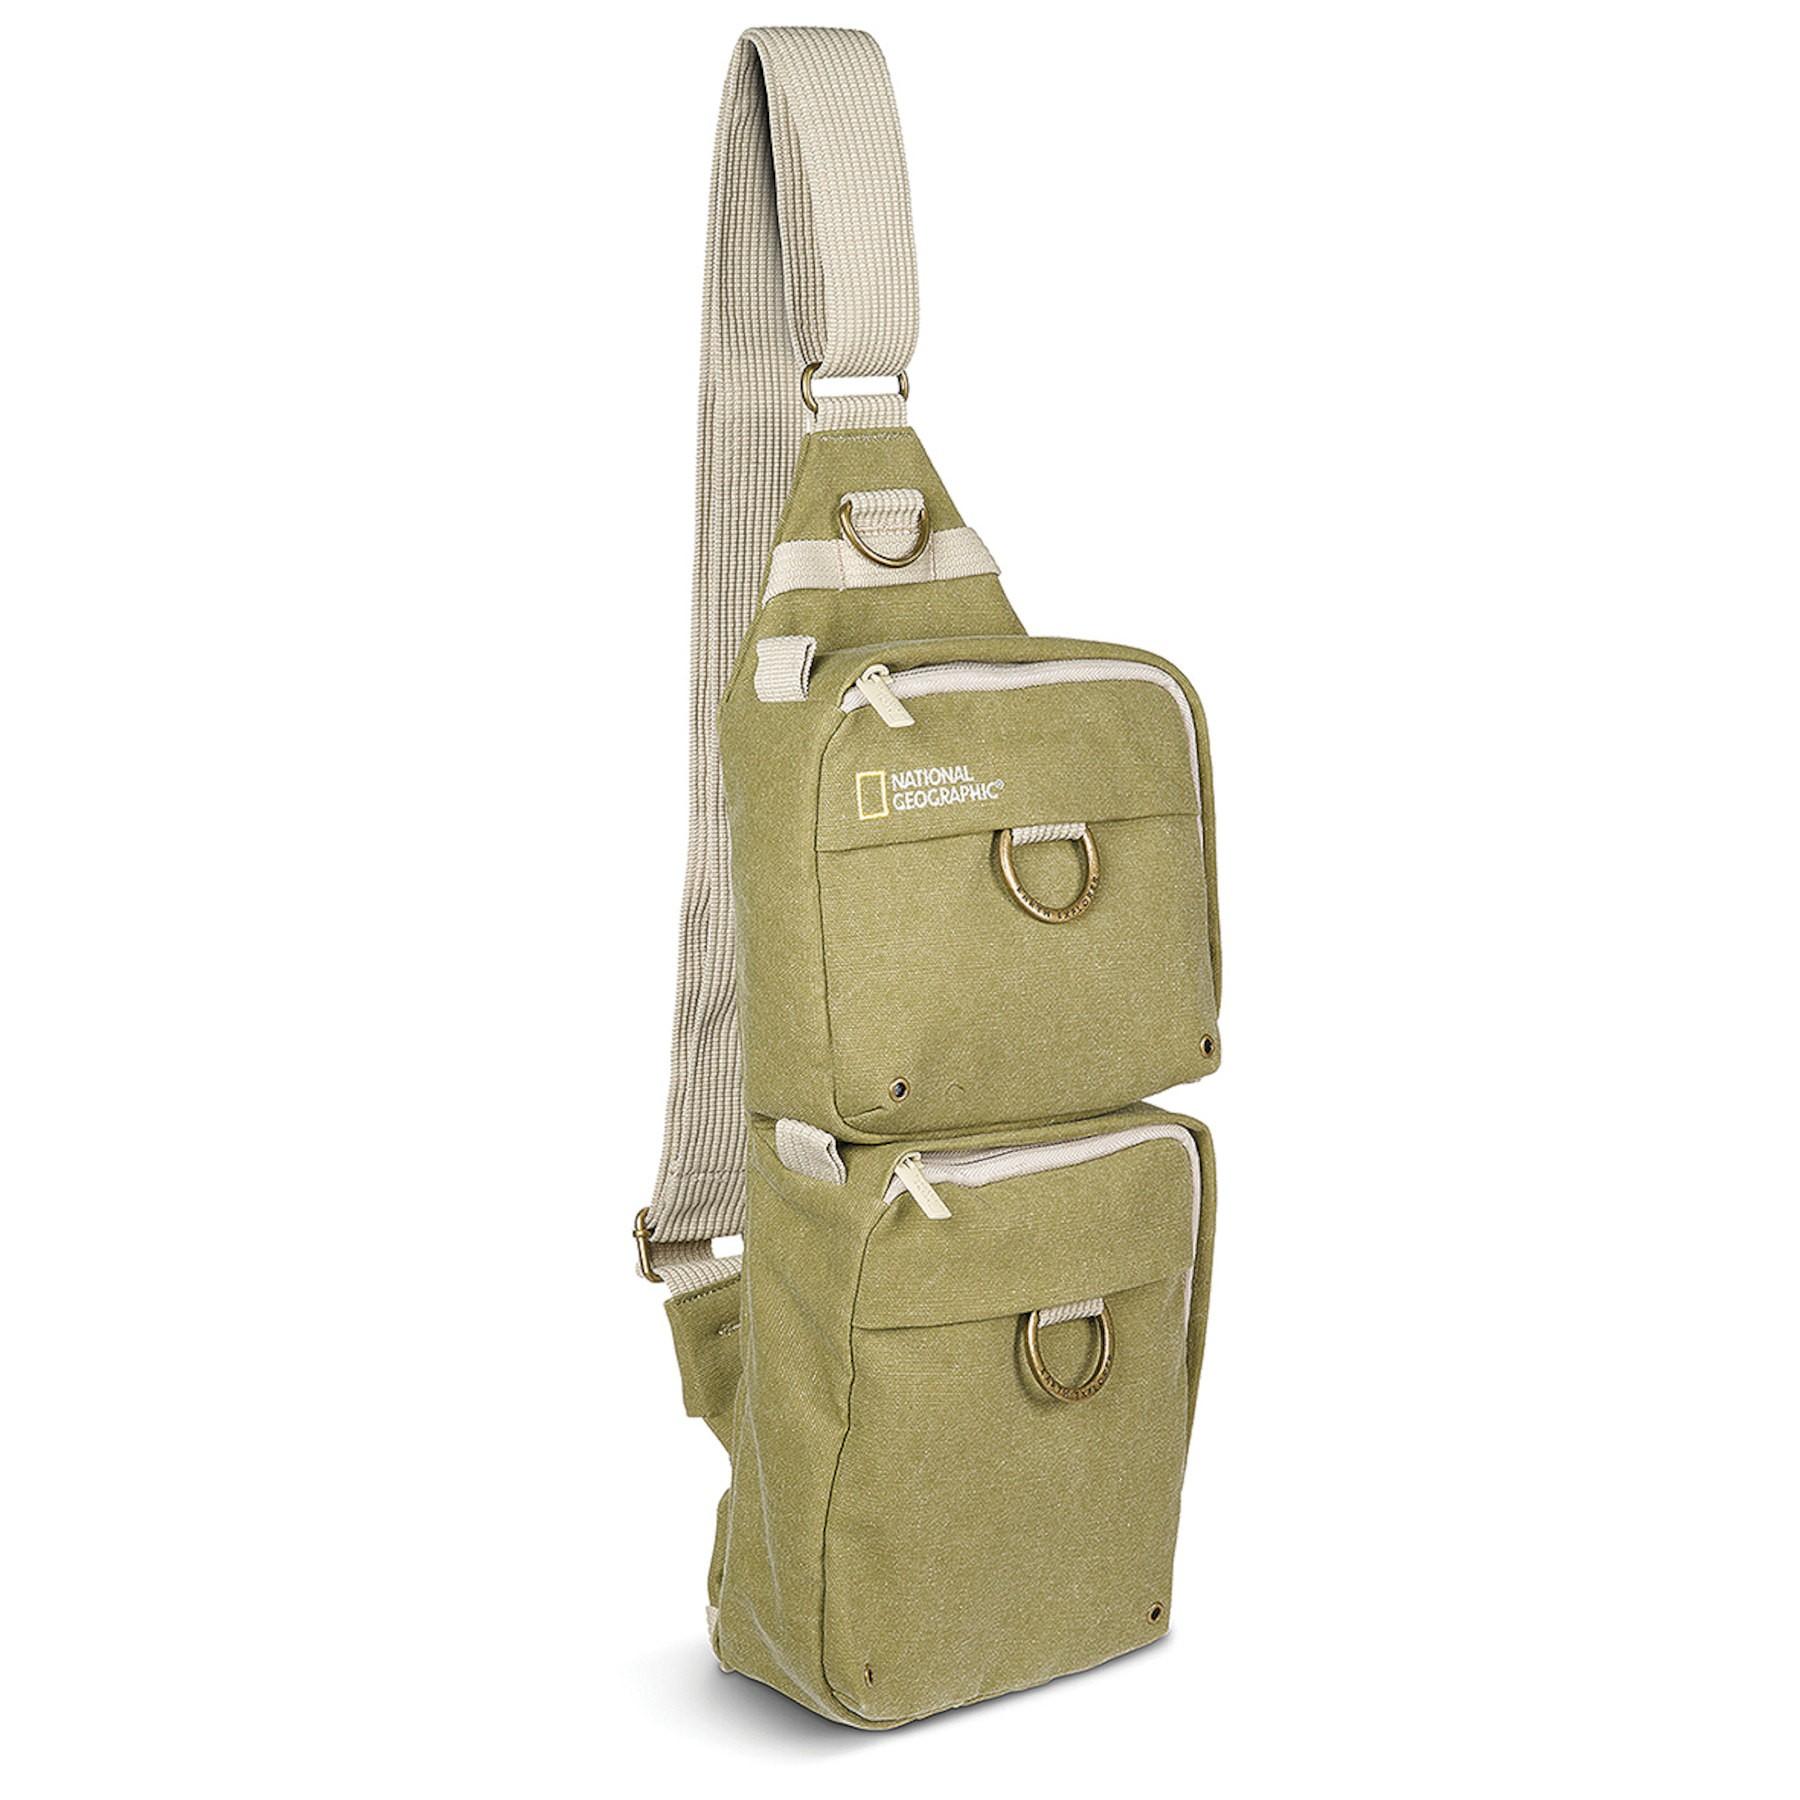 b84a912ff495 Фотосумки, рюкзаки, чехлы National Geographic - купить Фотосумки ...